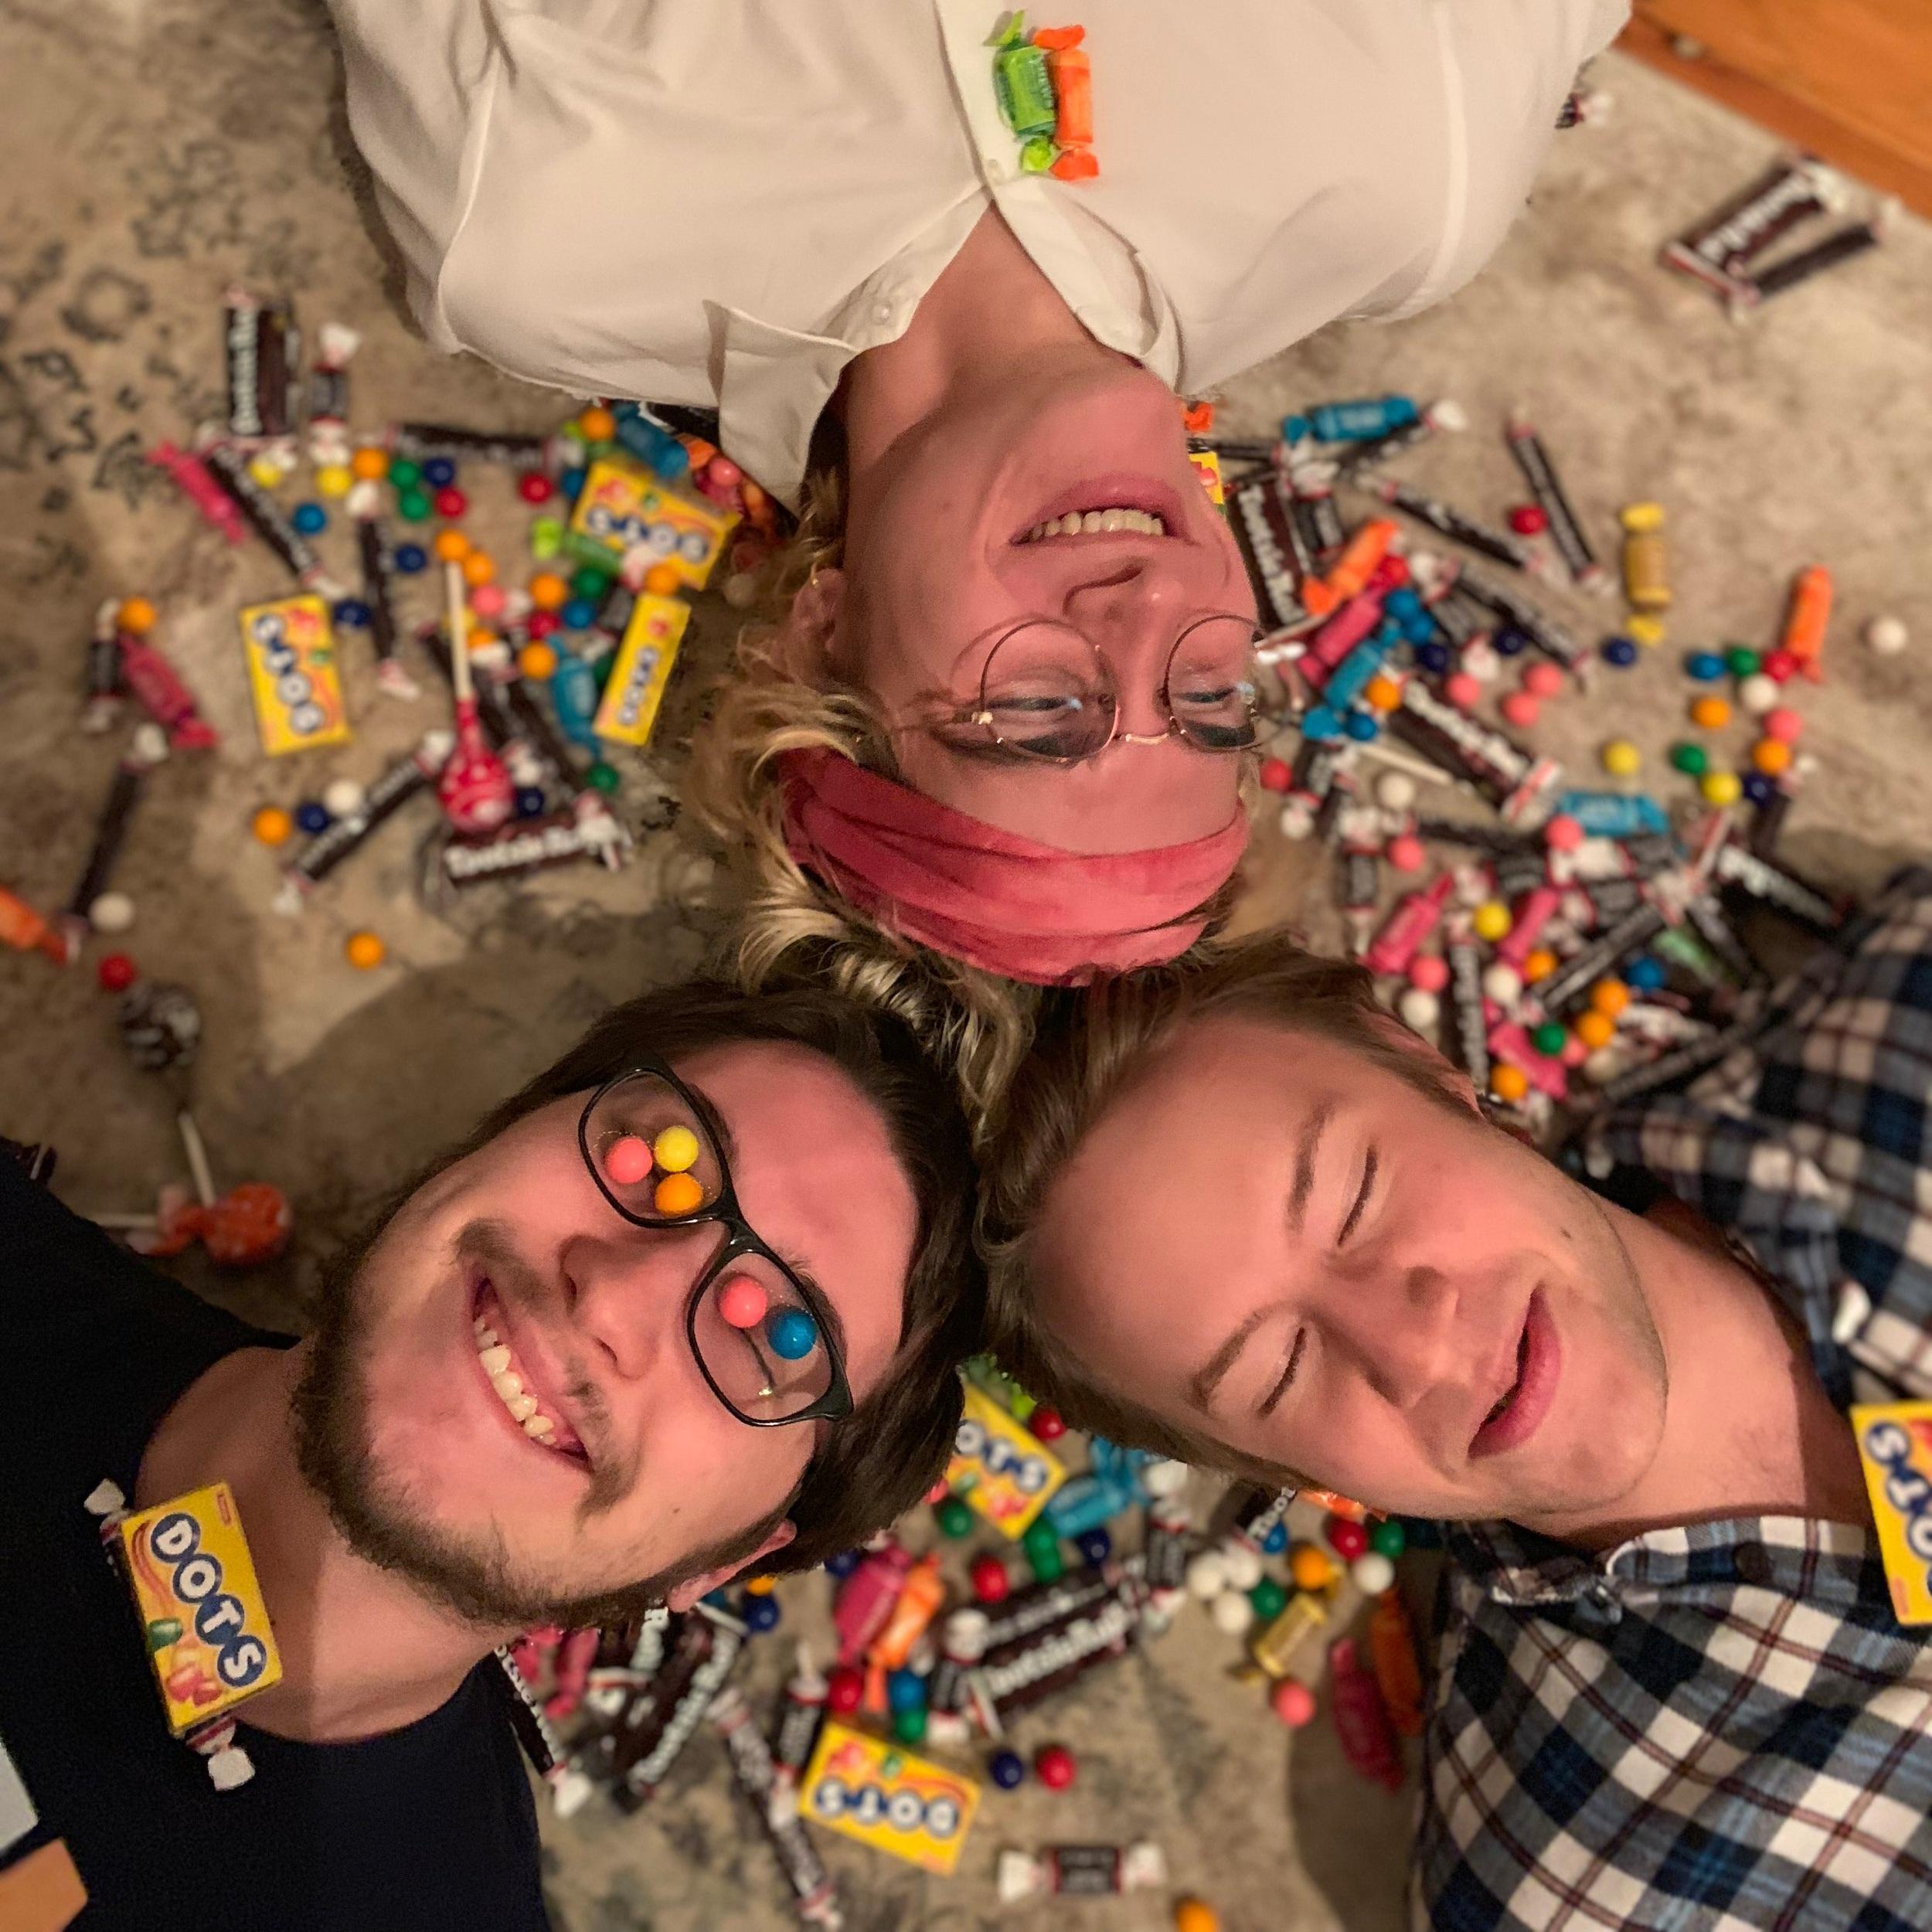 Dandy Candy -